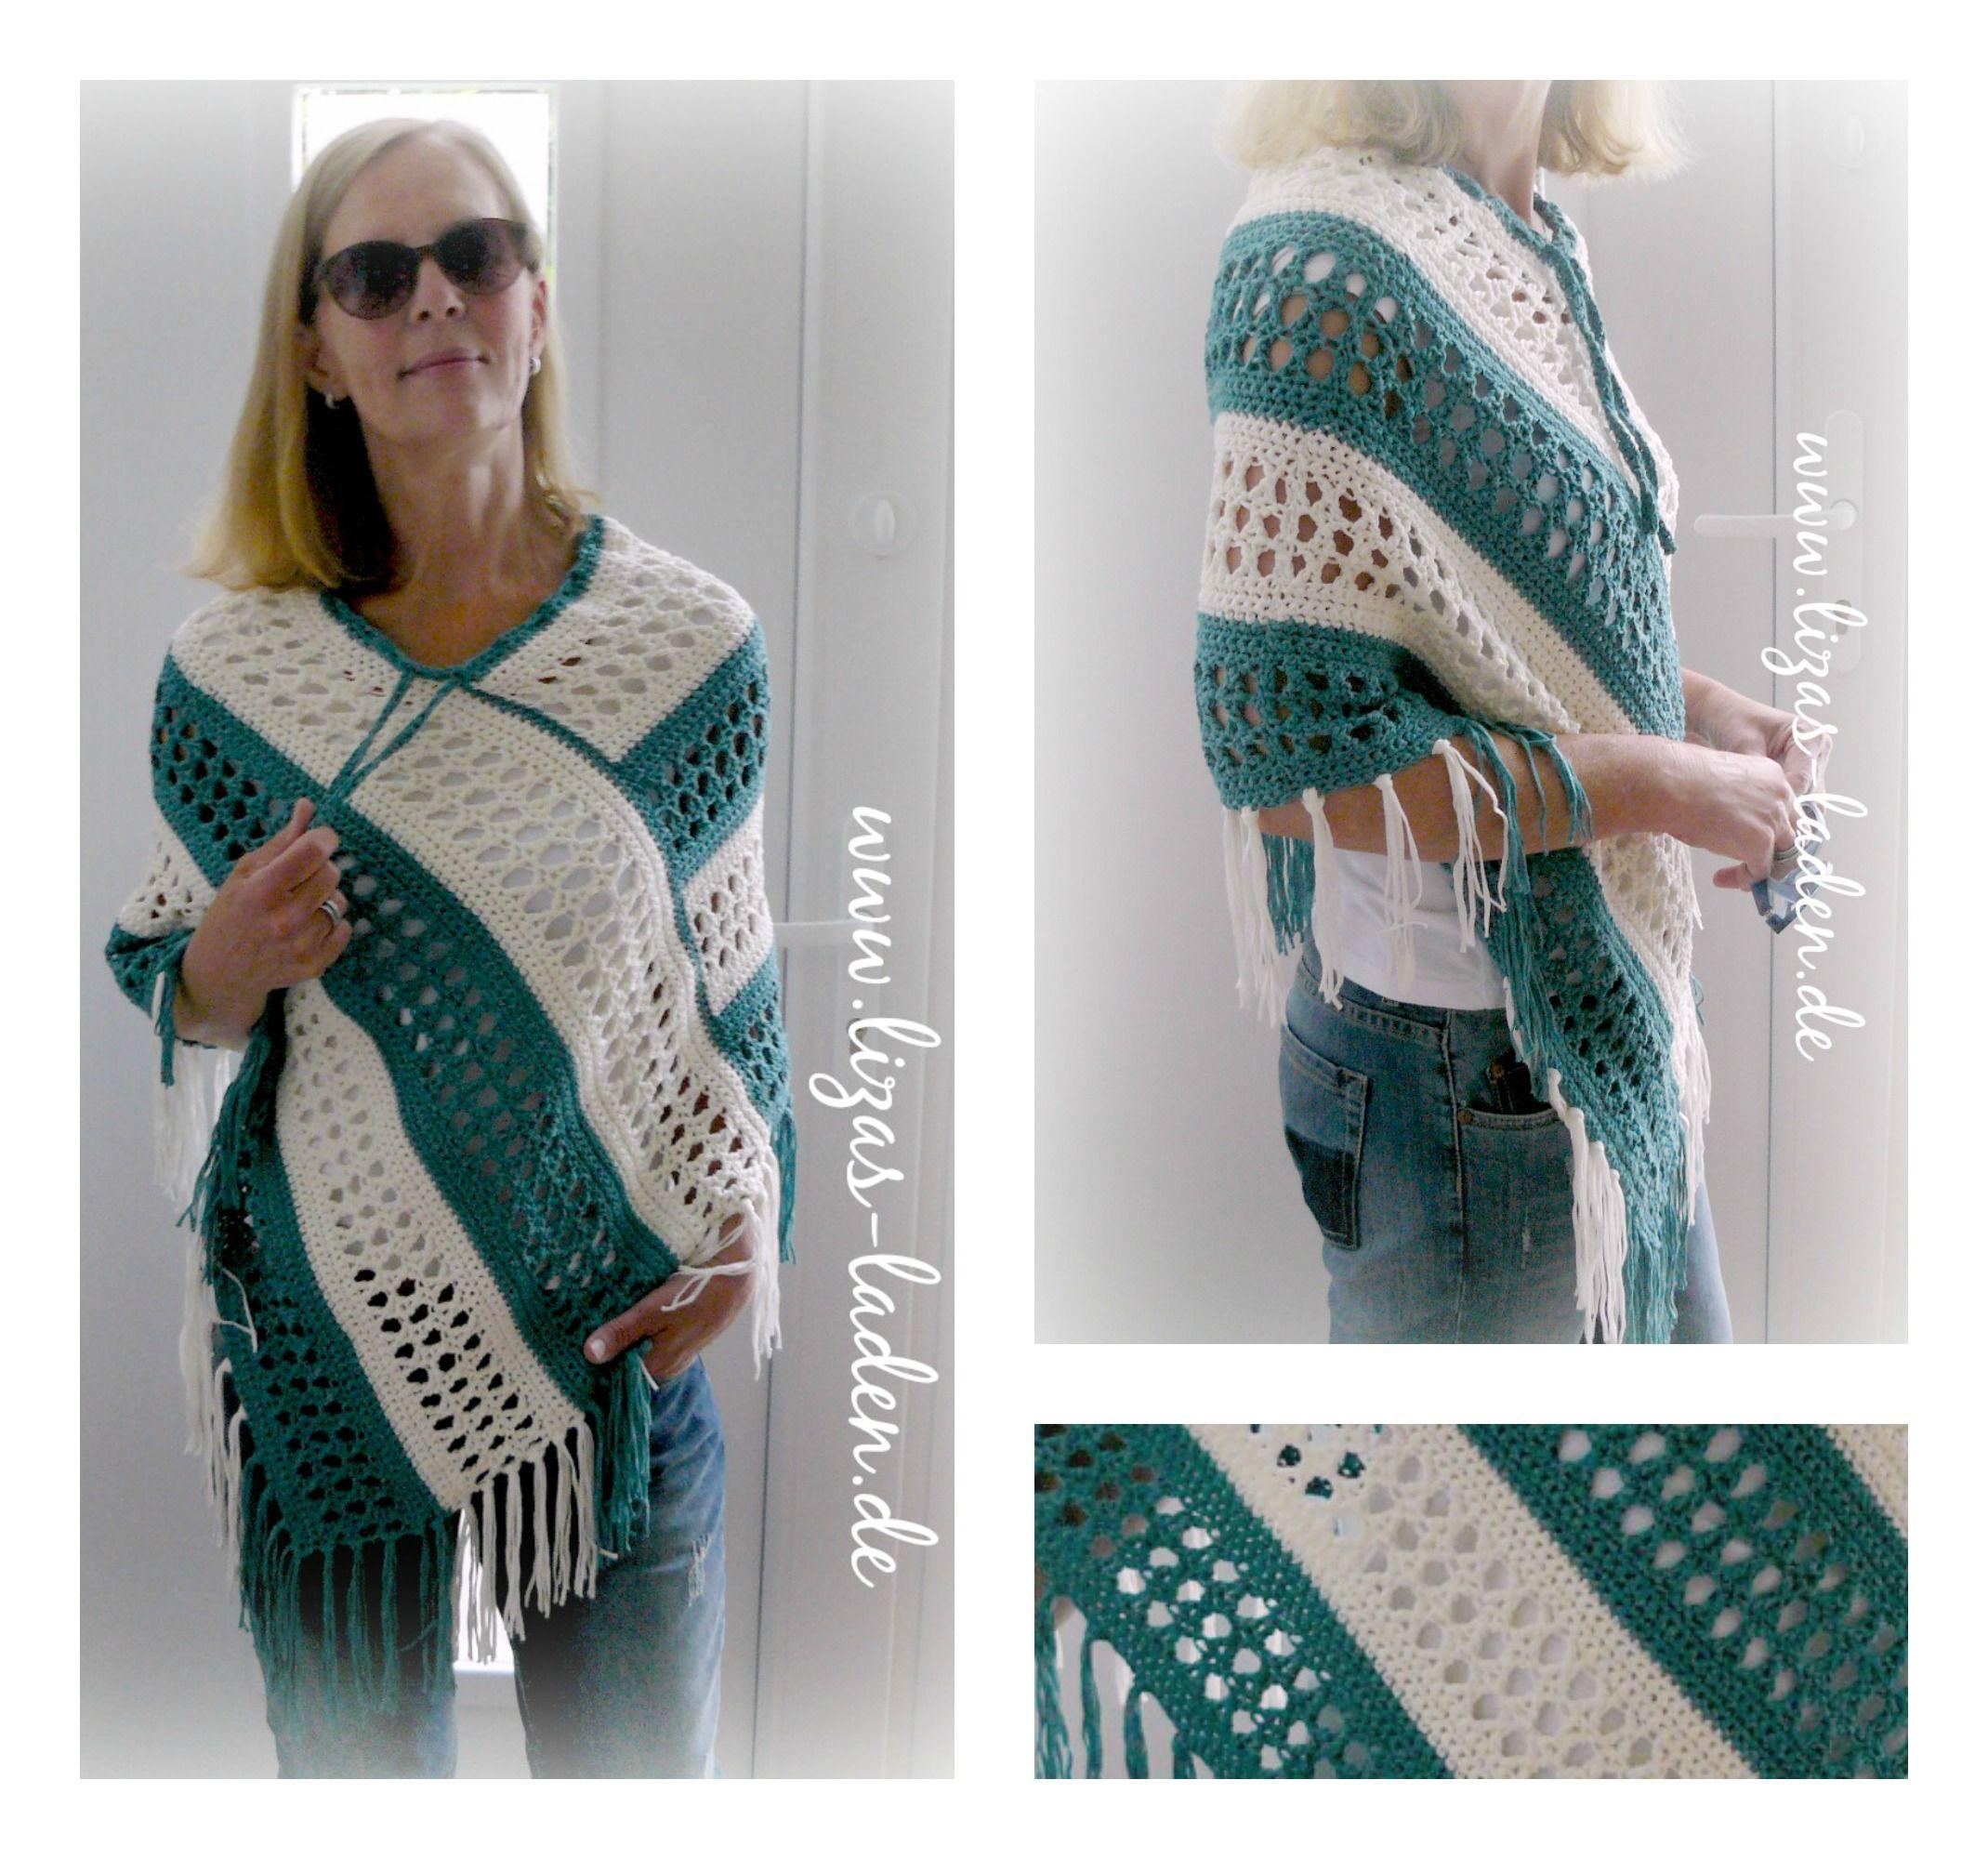 Pin Von Lizas Laden Auf Lizas Knitted Goods Pinterest Crochet